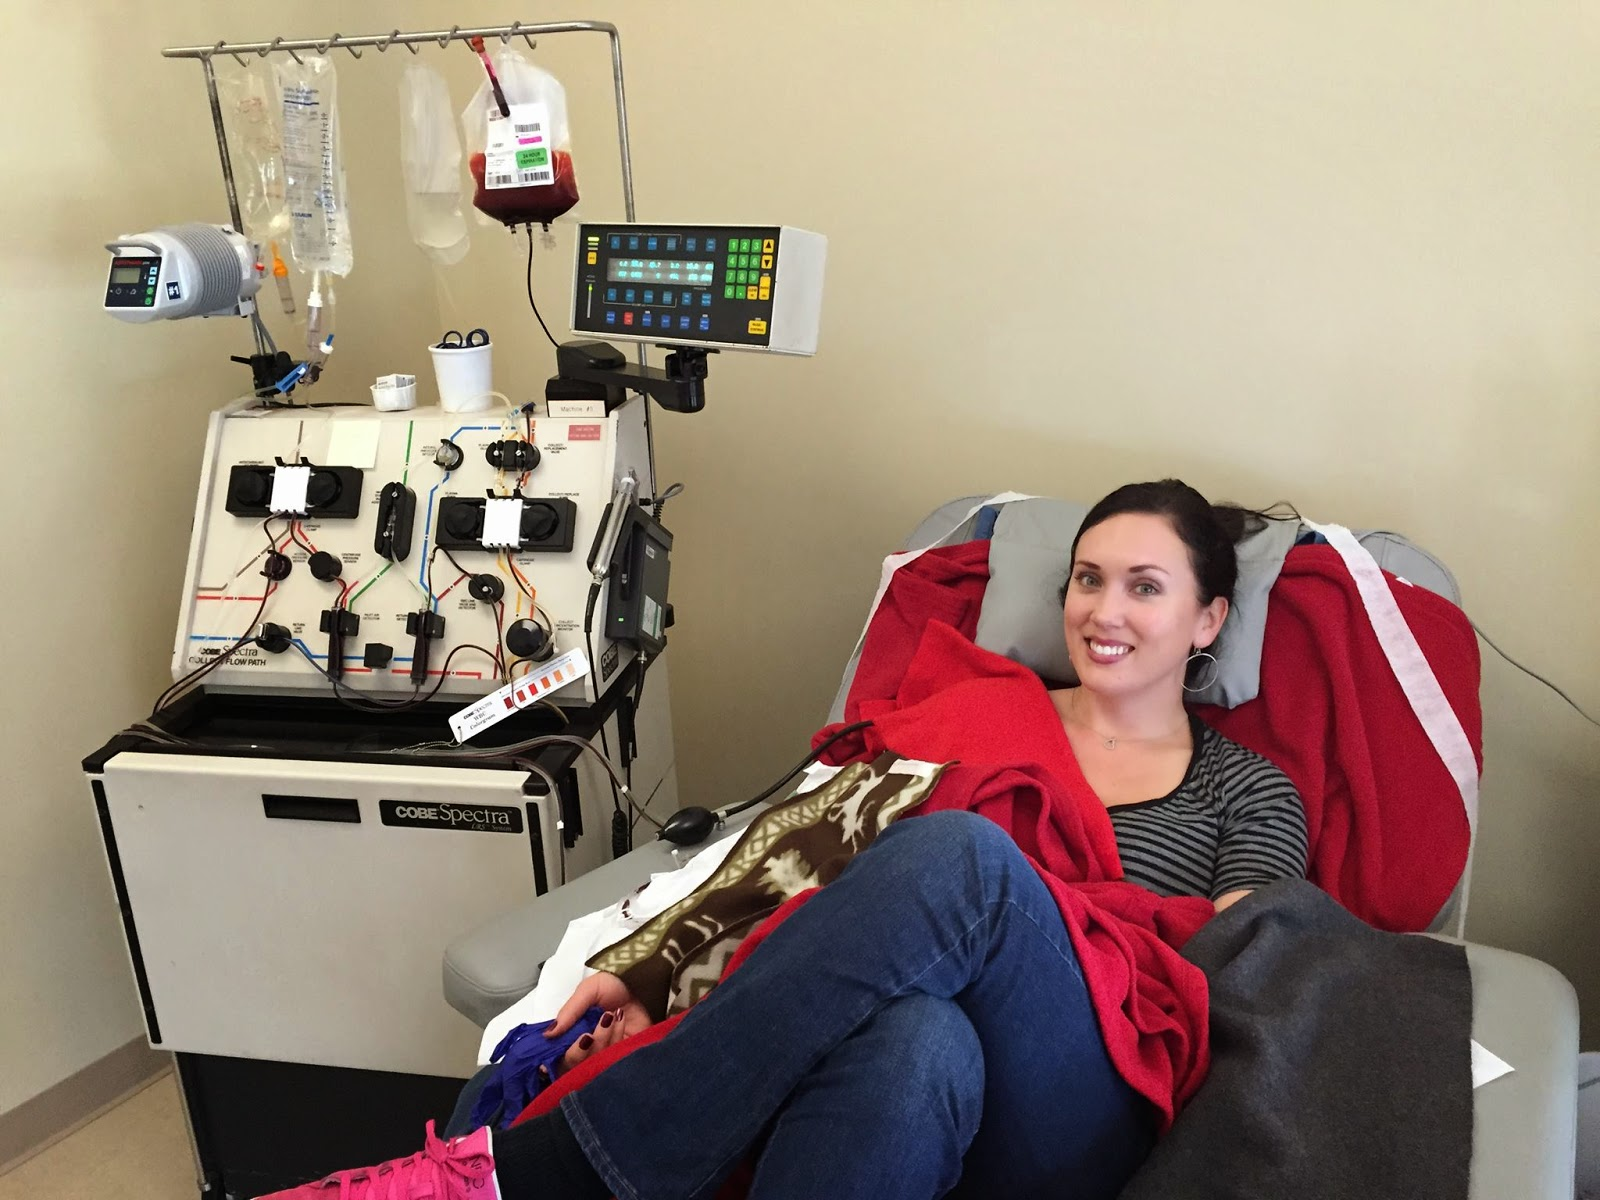 A grateful heart: Donating granulocytes, gaining compassion